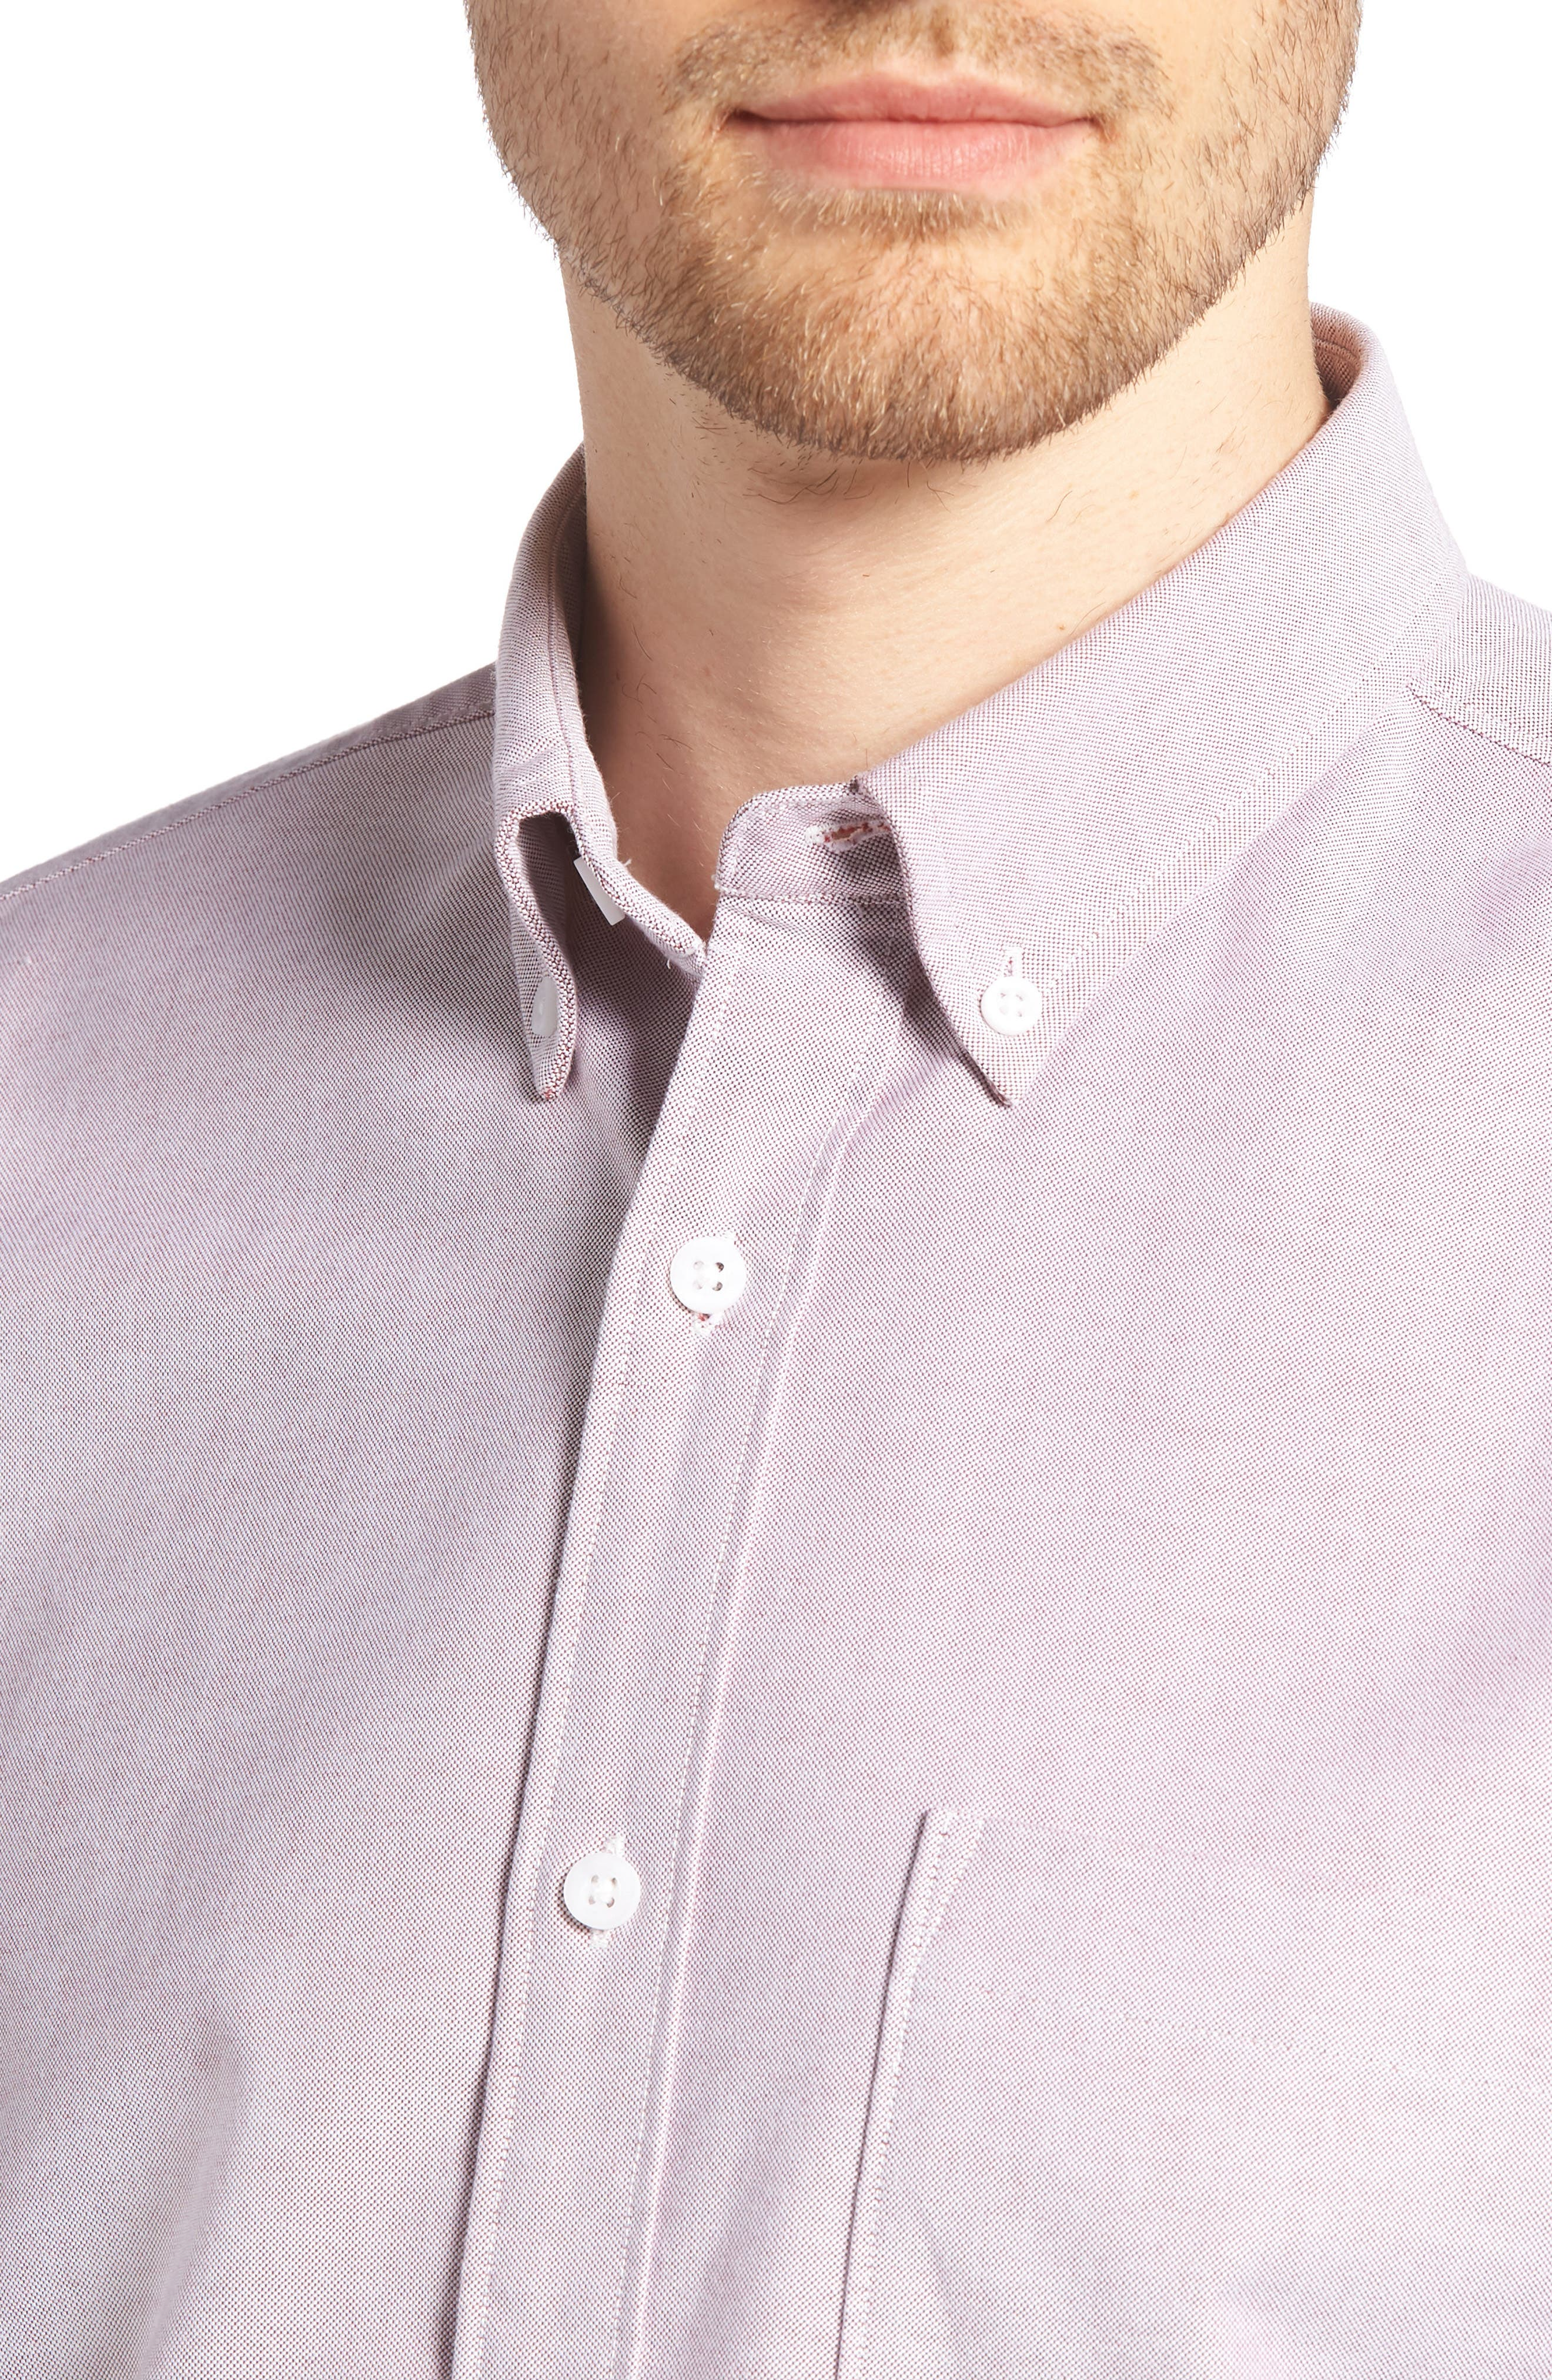 Trim Fit Washed Oxford Shirt,                             Alternate thumbnail 2, color,                             Burgundy London Oxford